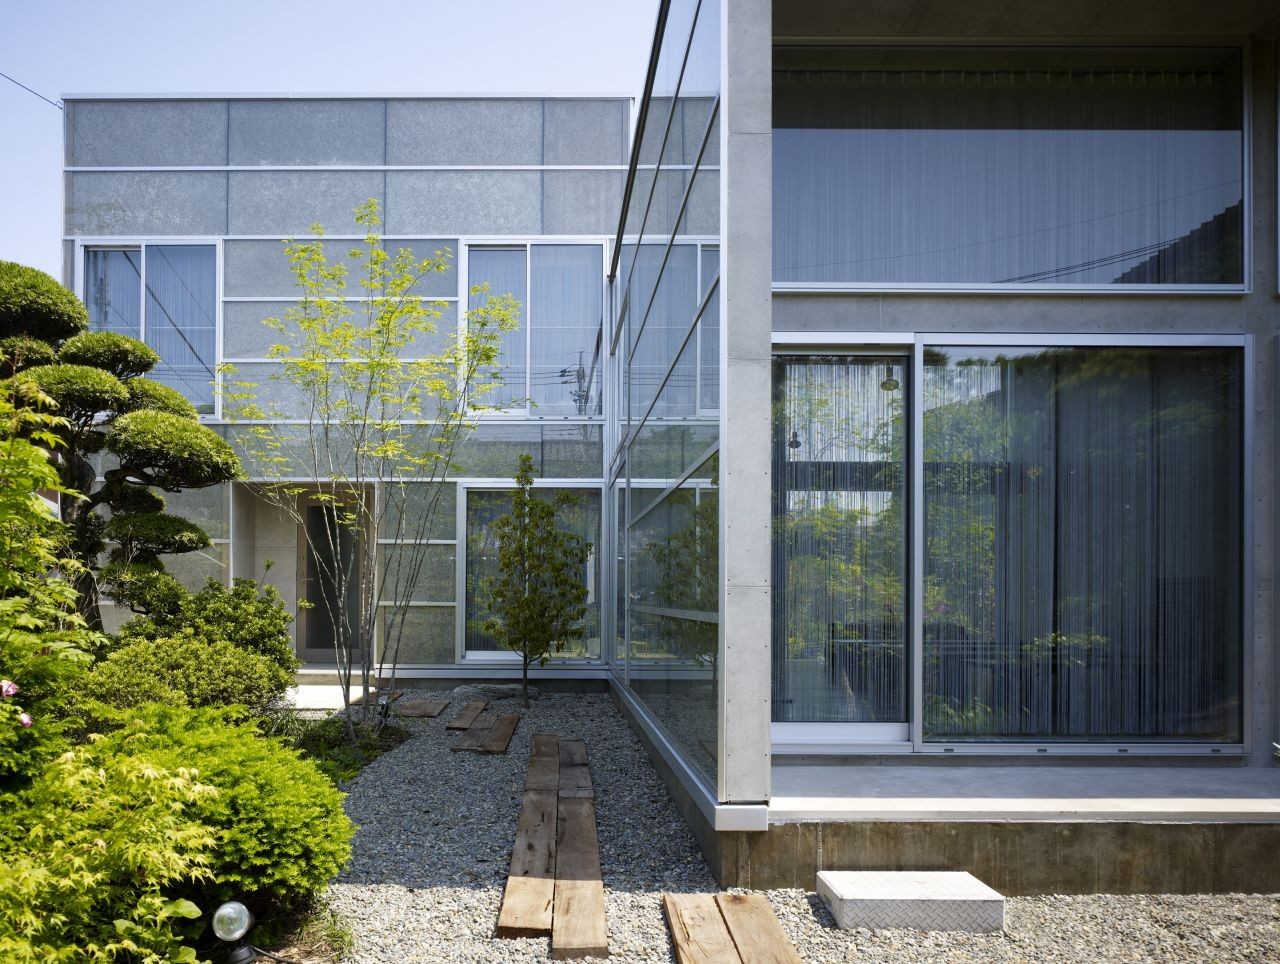 Garden House / Kochi Architect's Studio, © Daichi Ano